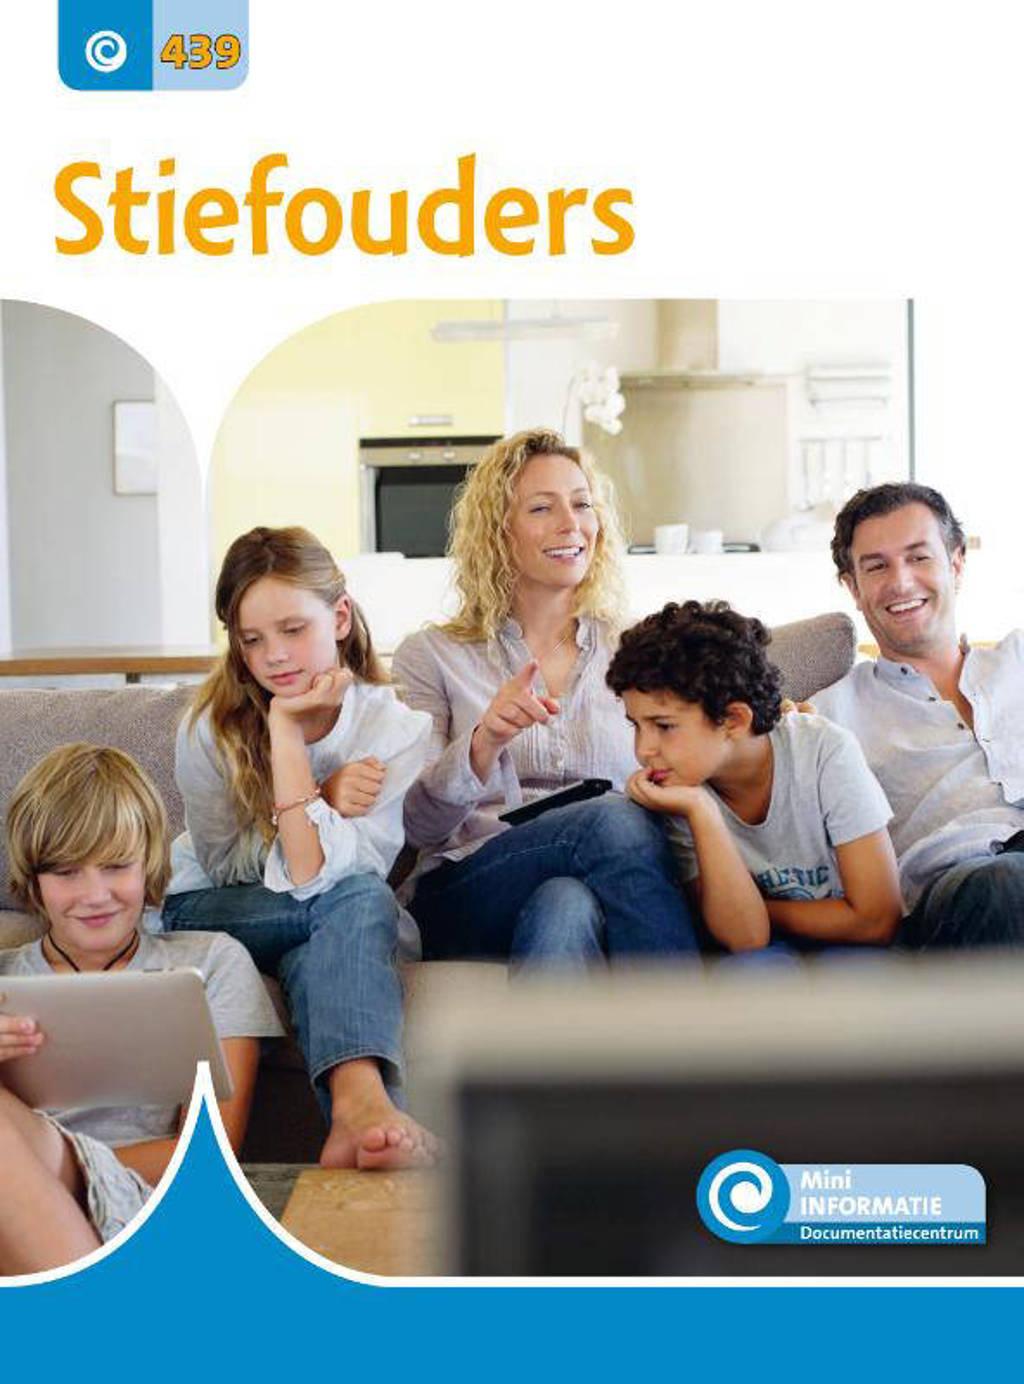 Mini Informatie: Stiefouders - Marianne Meulepas